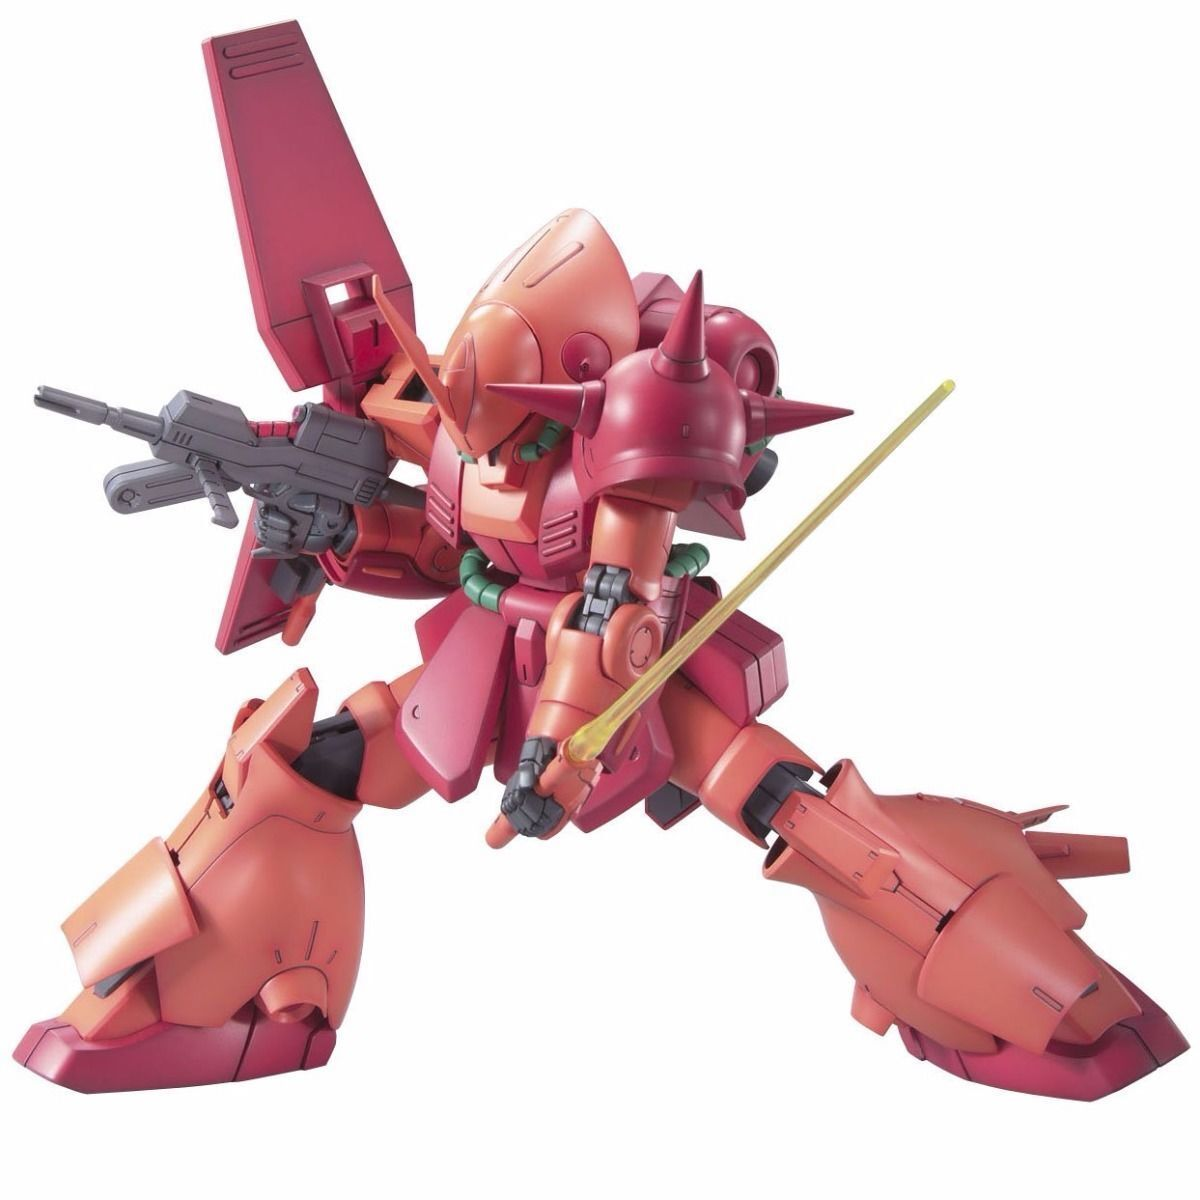 BANDAI MG 1 100 RMS-108 MARASAI MARASAI MARASAI Plastic Model Kit Z Gundam from Japan f3511f